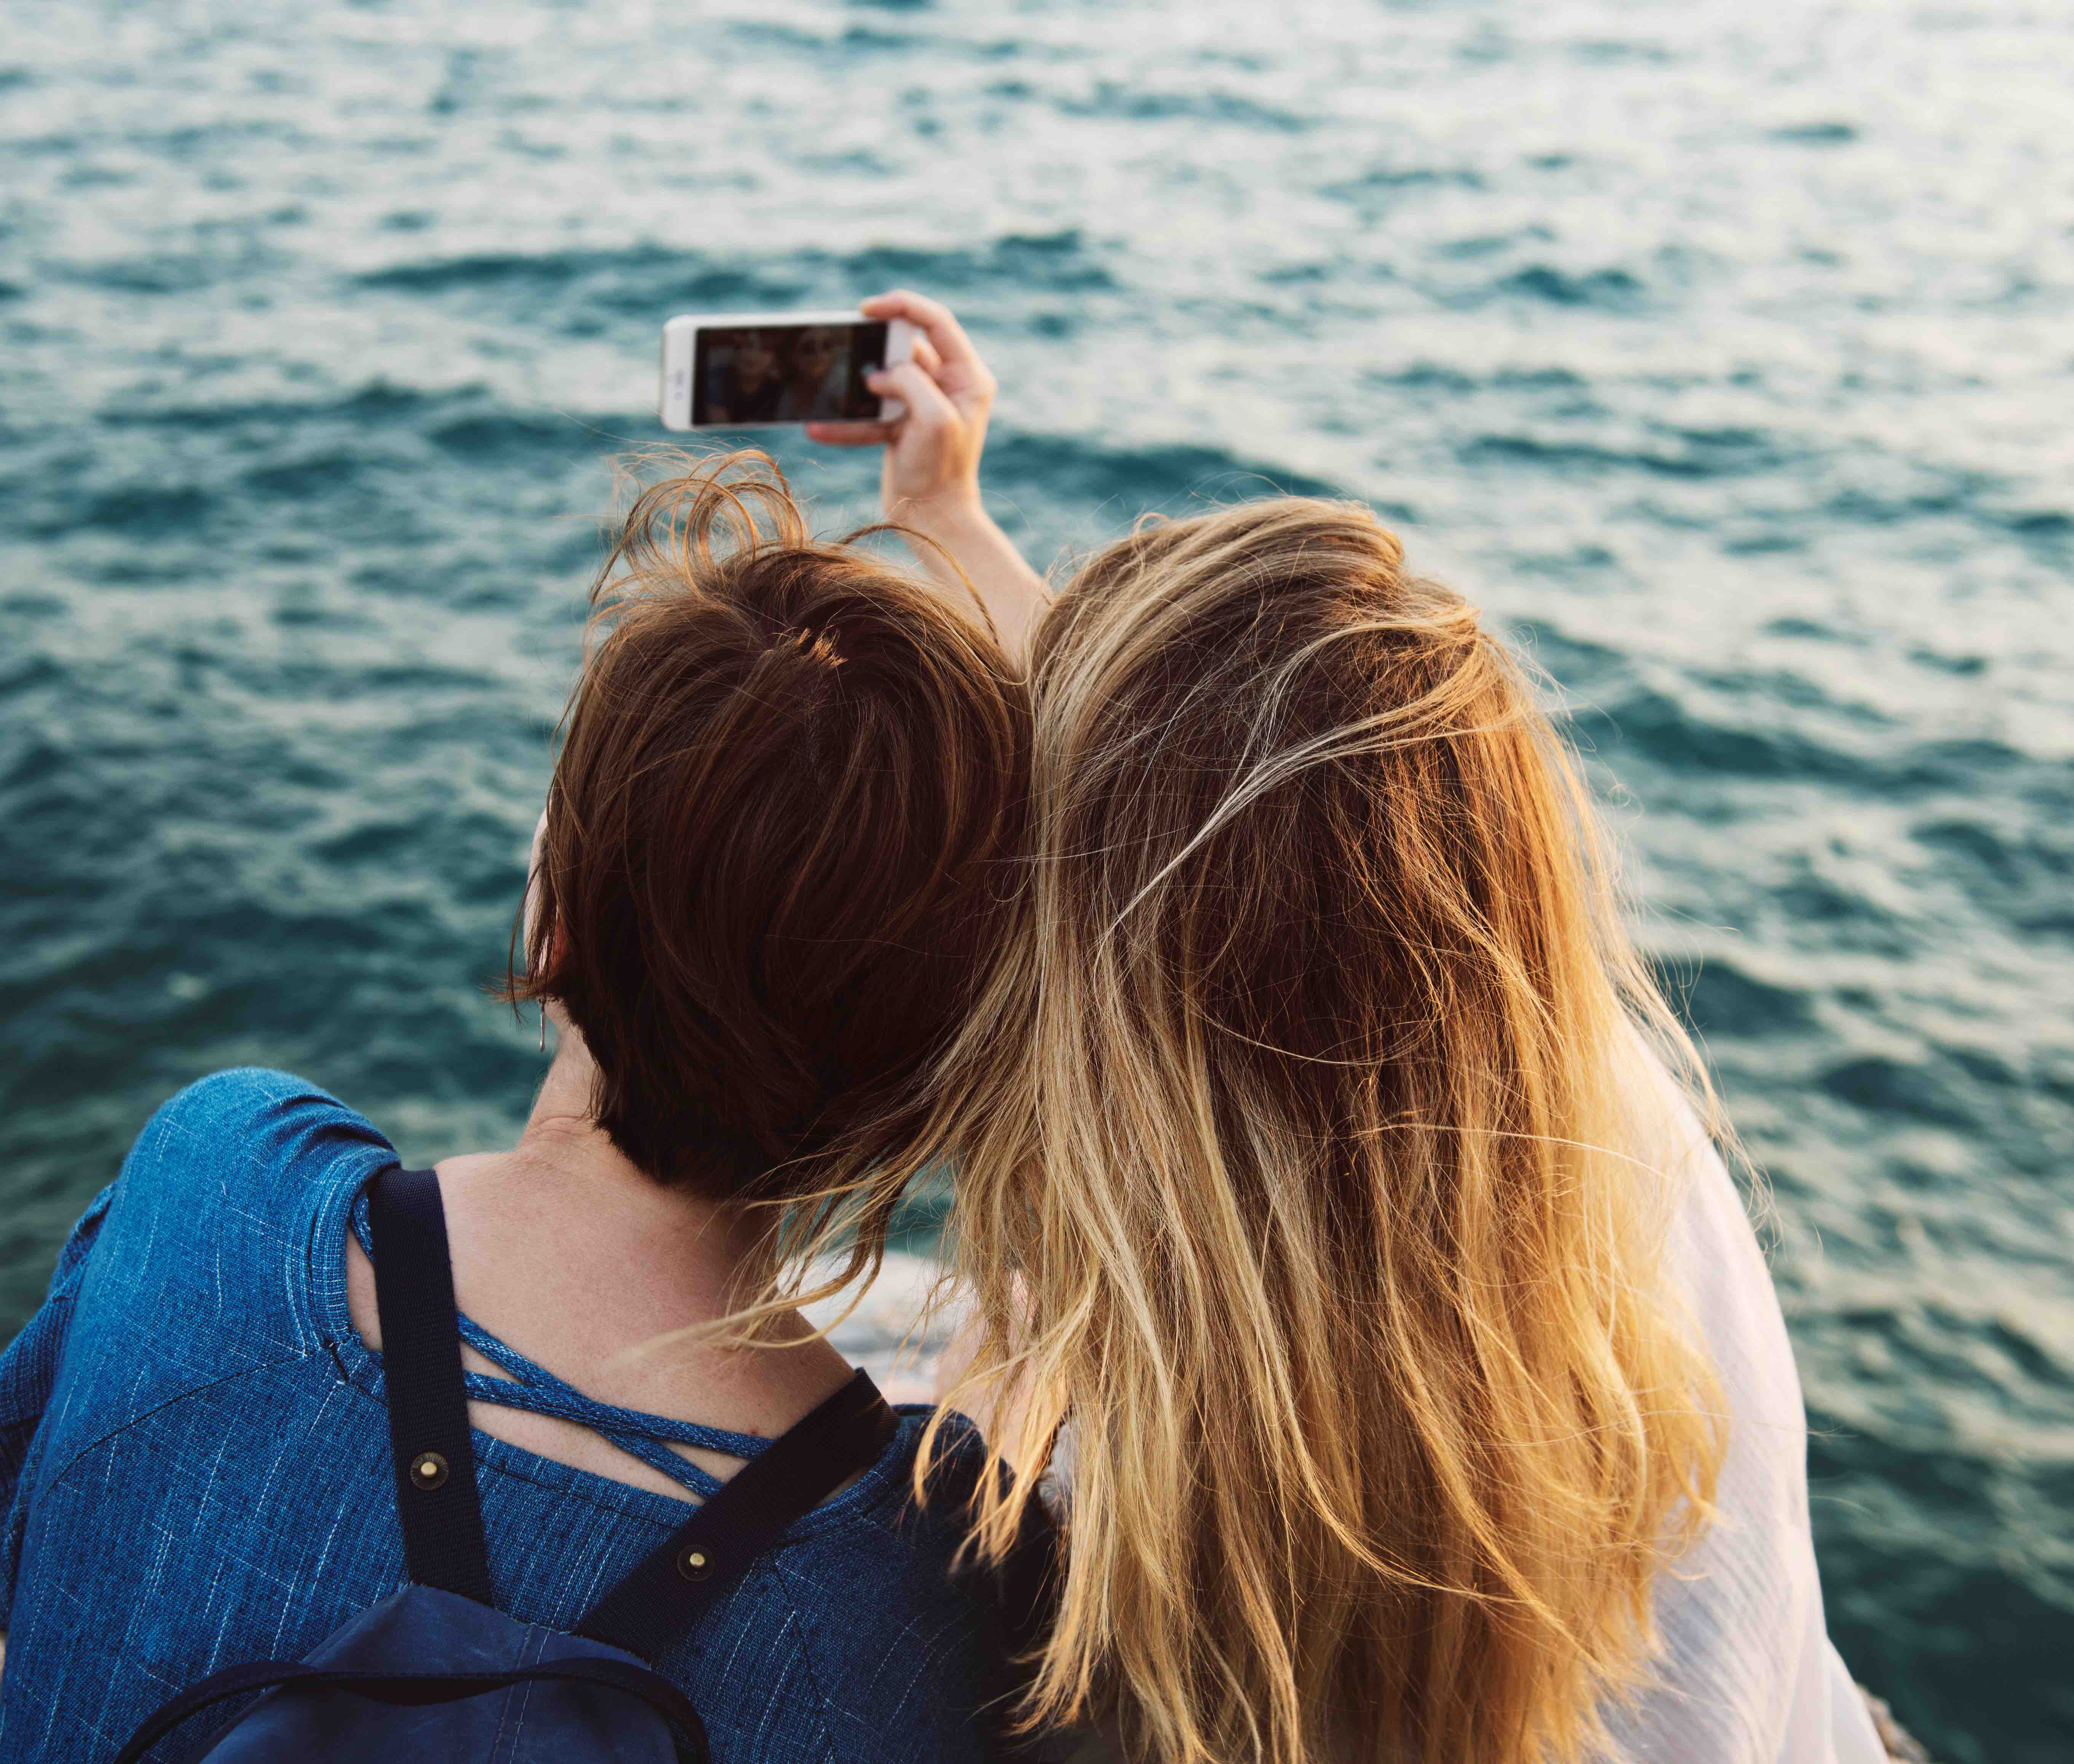 adults-adventure-beach-smartphone